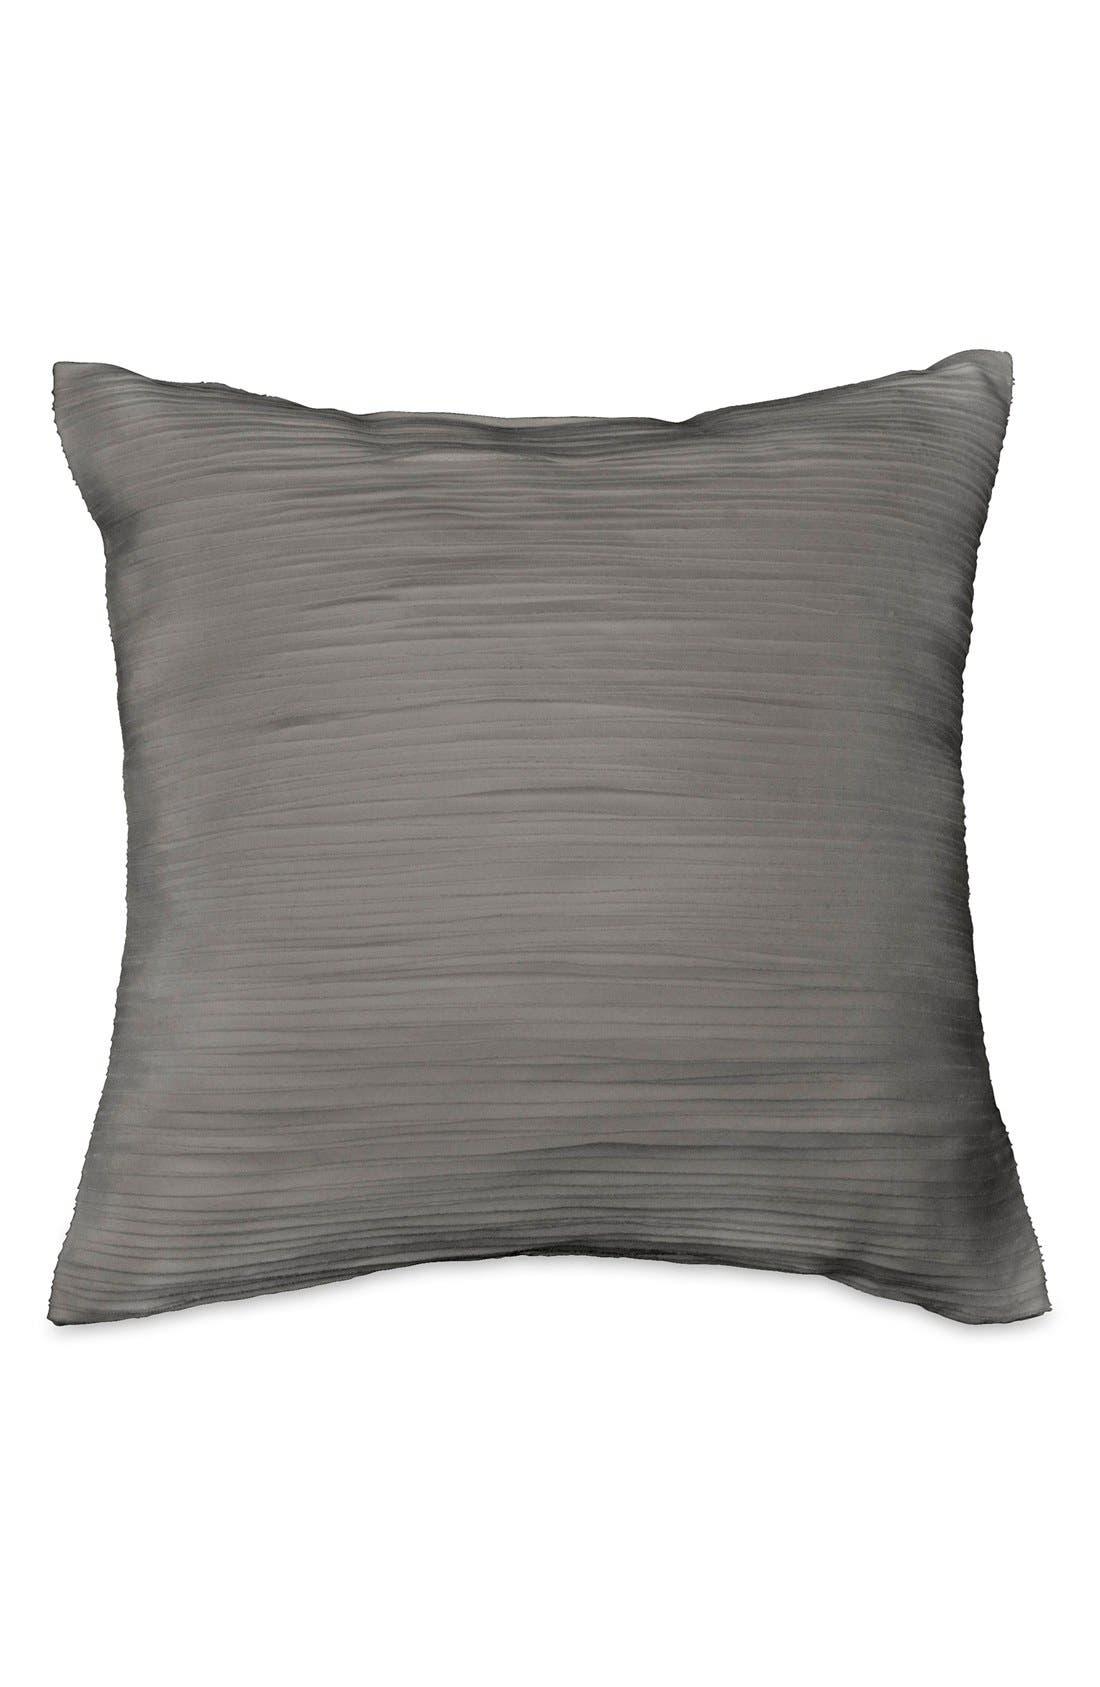 Alternate Image 1 Selected - Donna Karan Collection 'Silk Essentials' Pillow